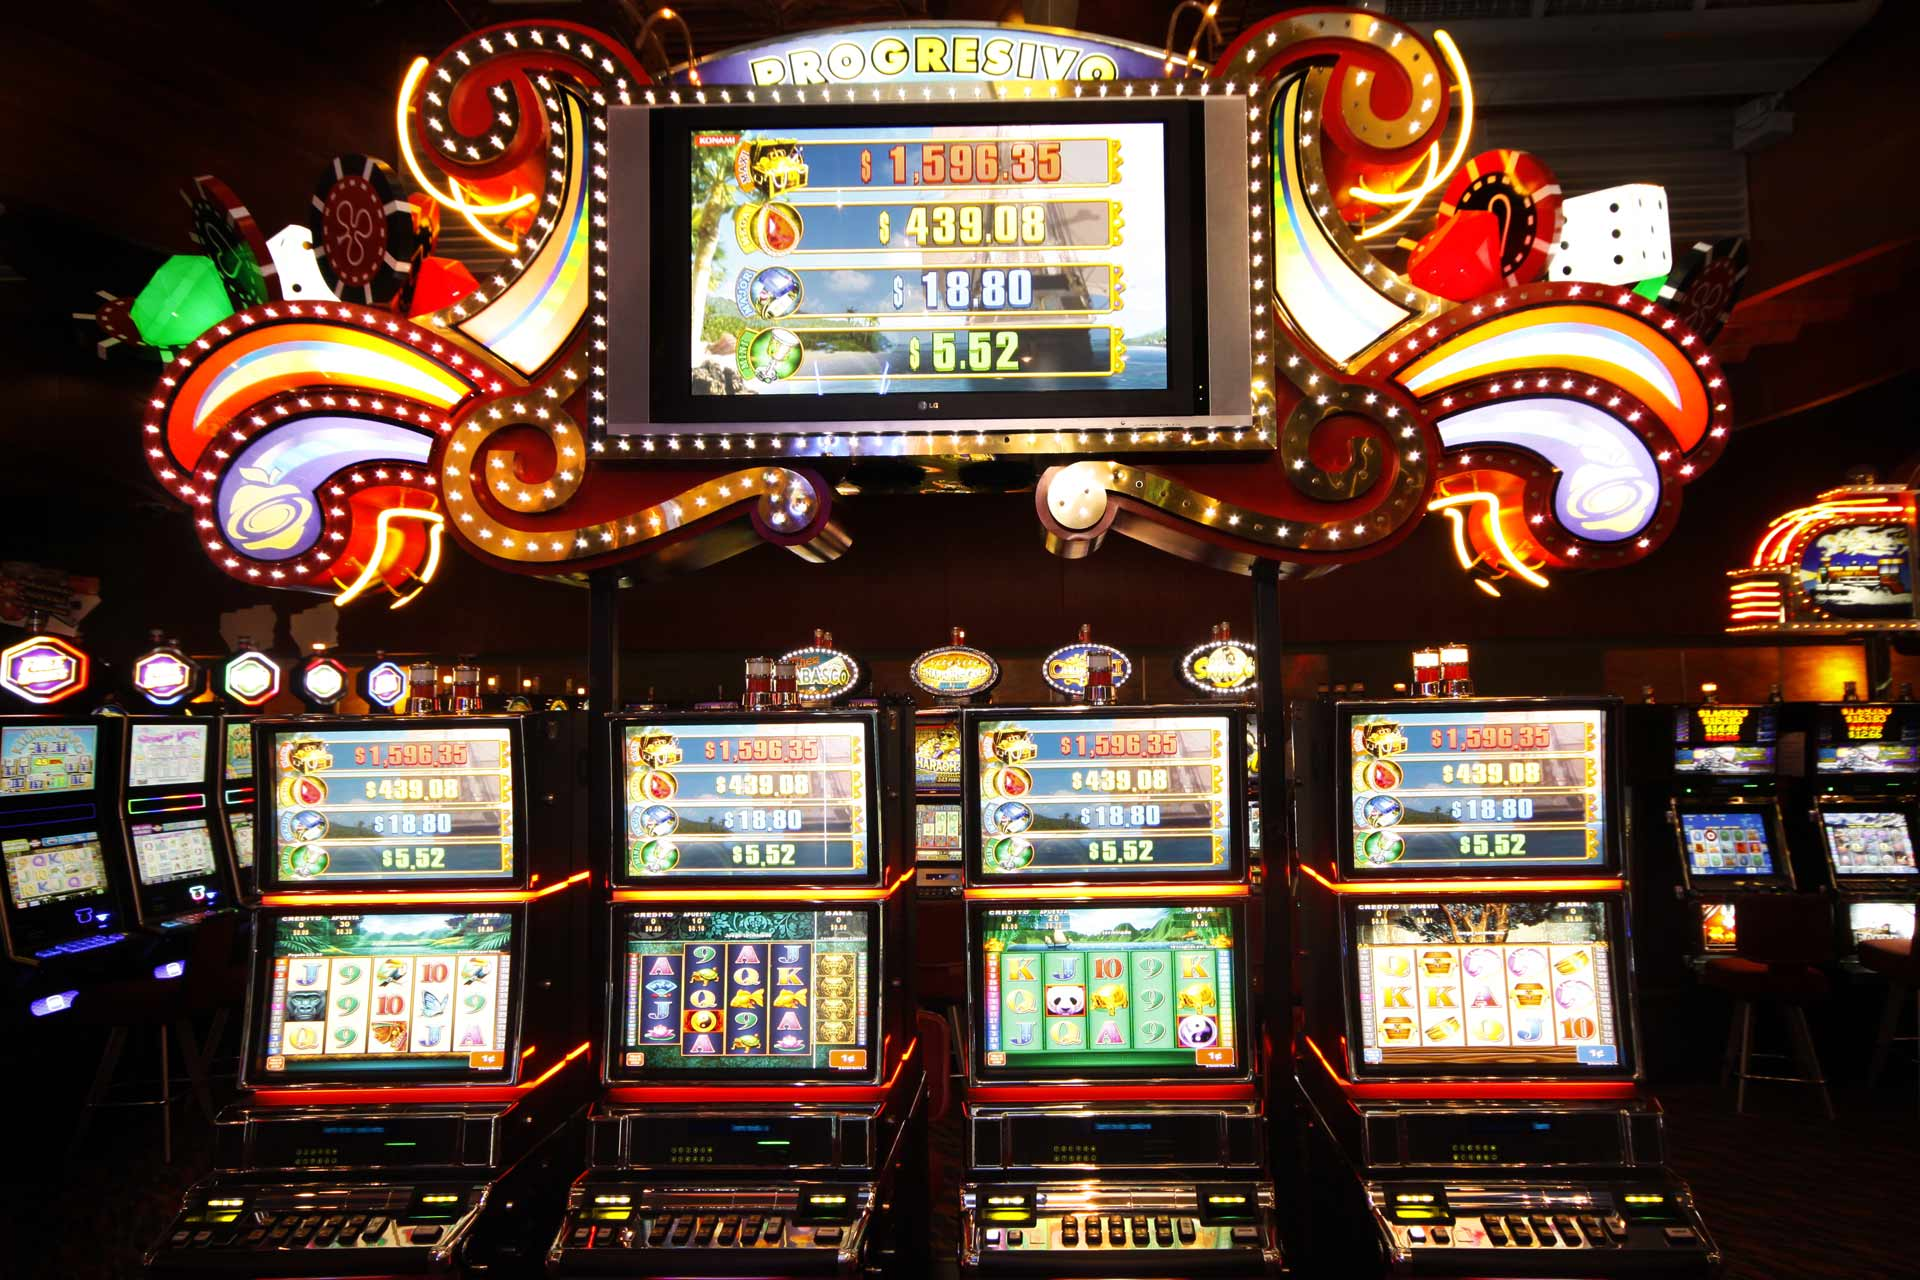 Slots progresivo Casino Majestic Panama City